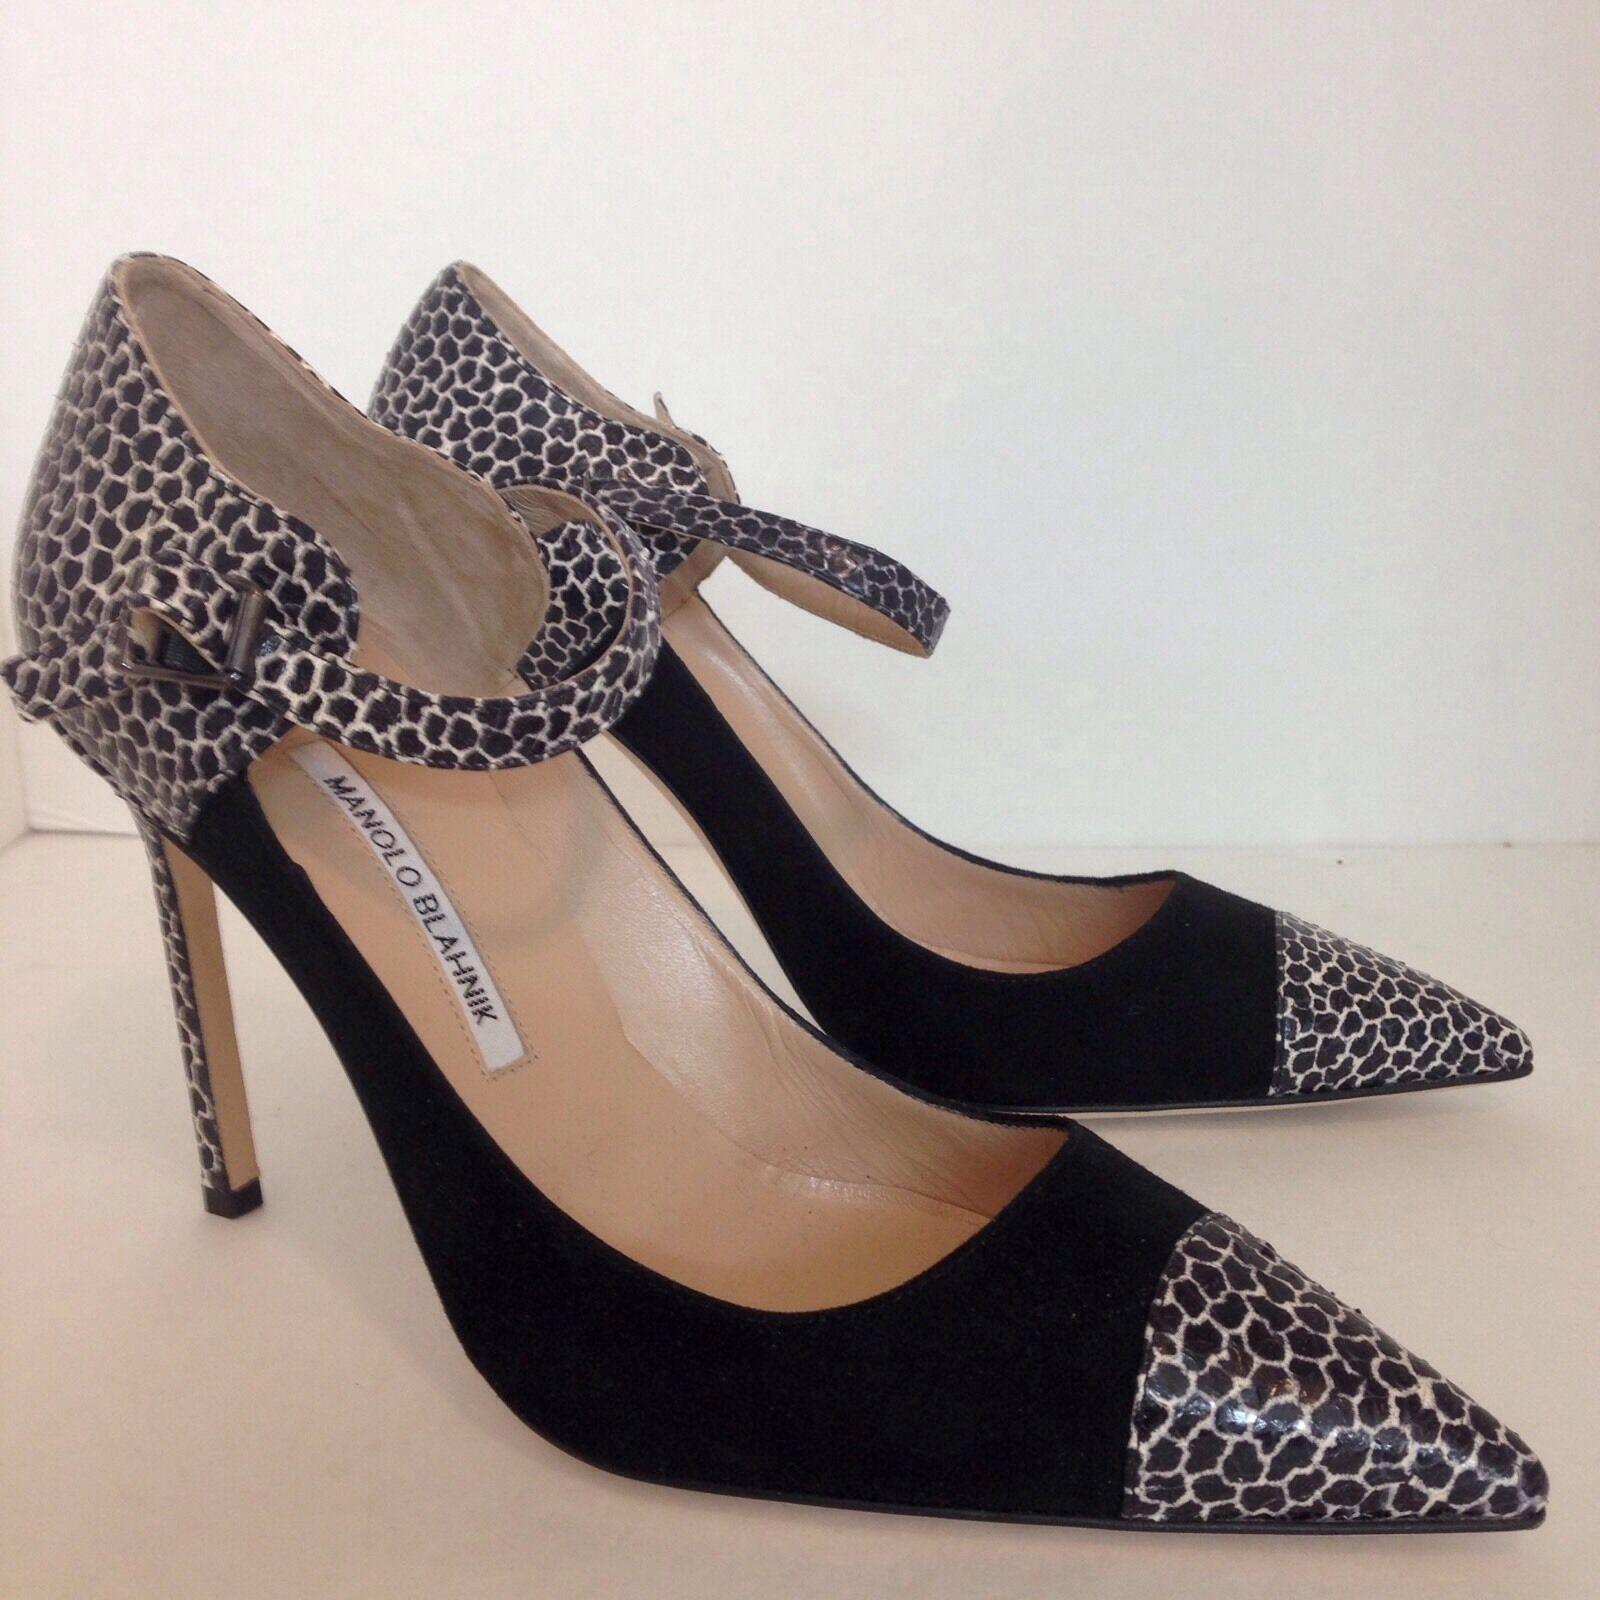 Manolo Blahnik Zapatos Negro Gamuza impresión impresión impresión puntera y talón Nuevo Talle 40  venta directa de fábrica